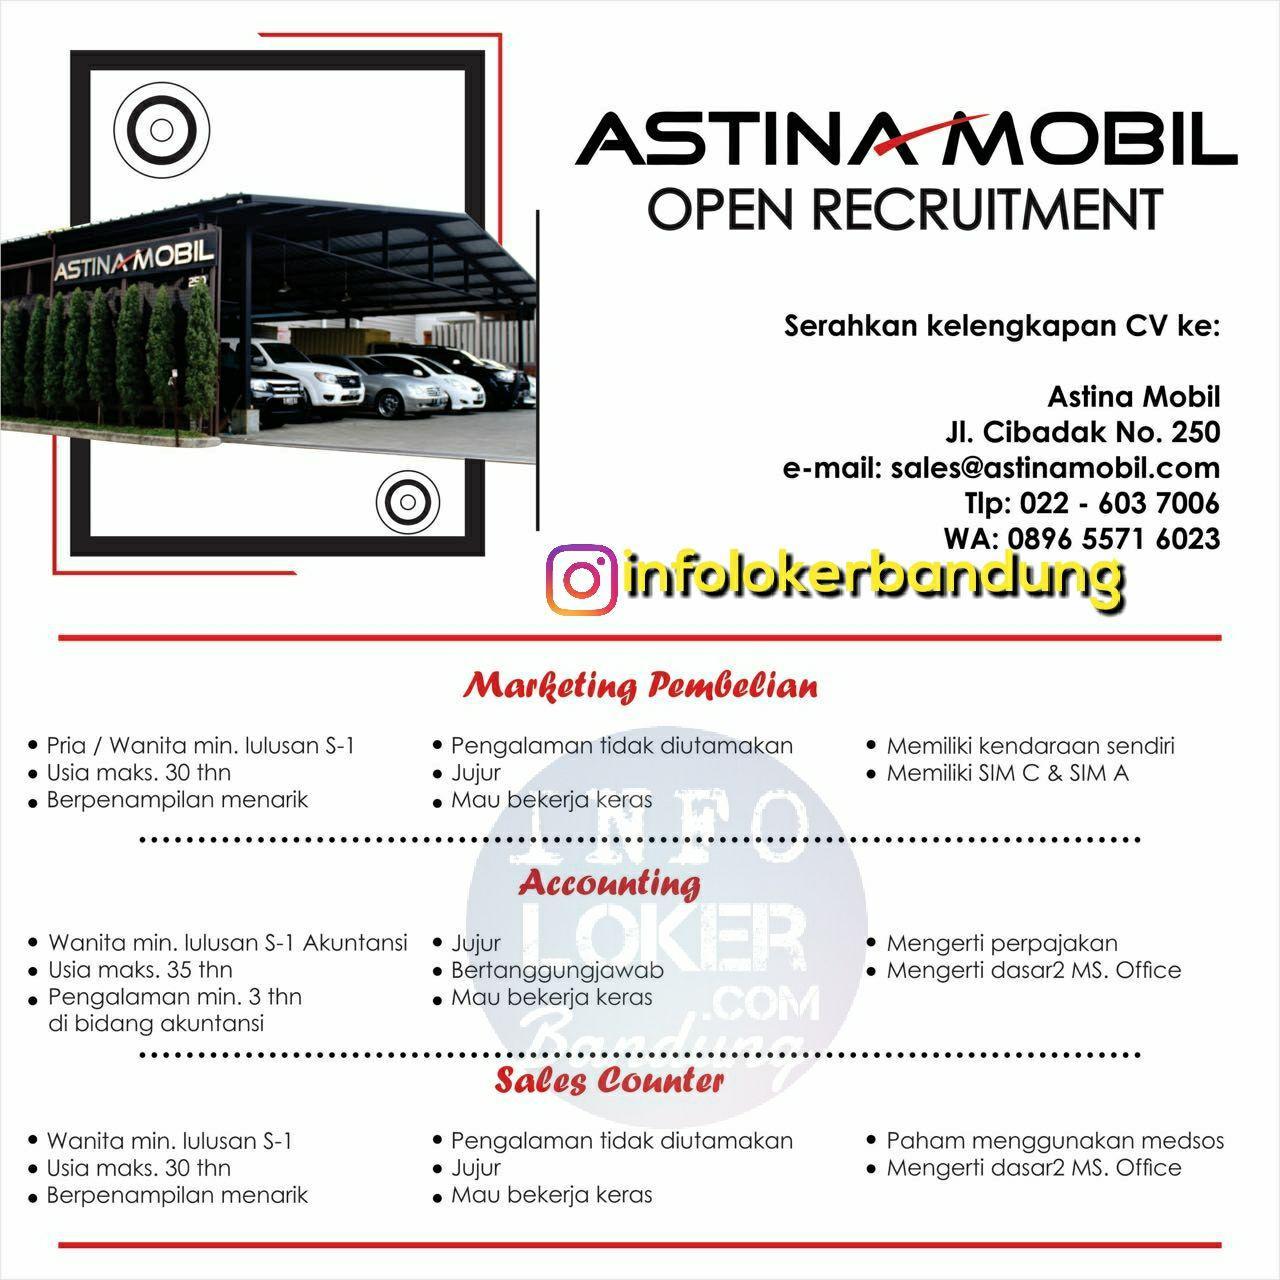 Lowongan Kerja Astina Mobil Bandung November 2017